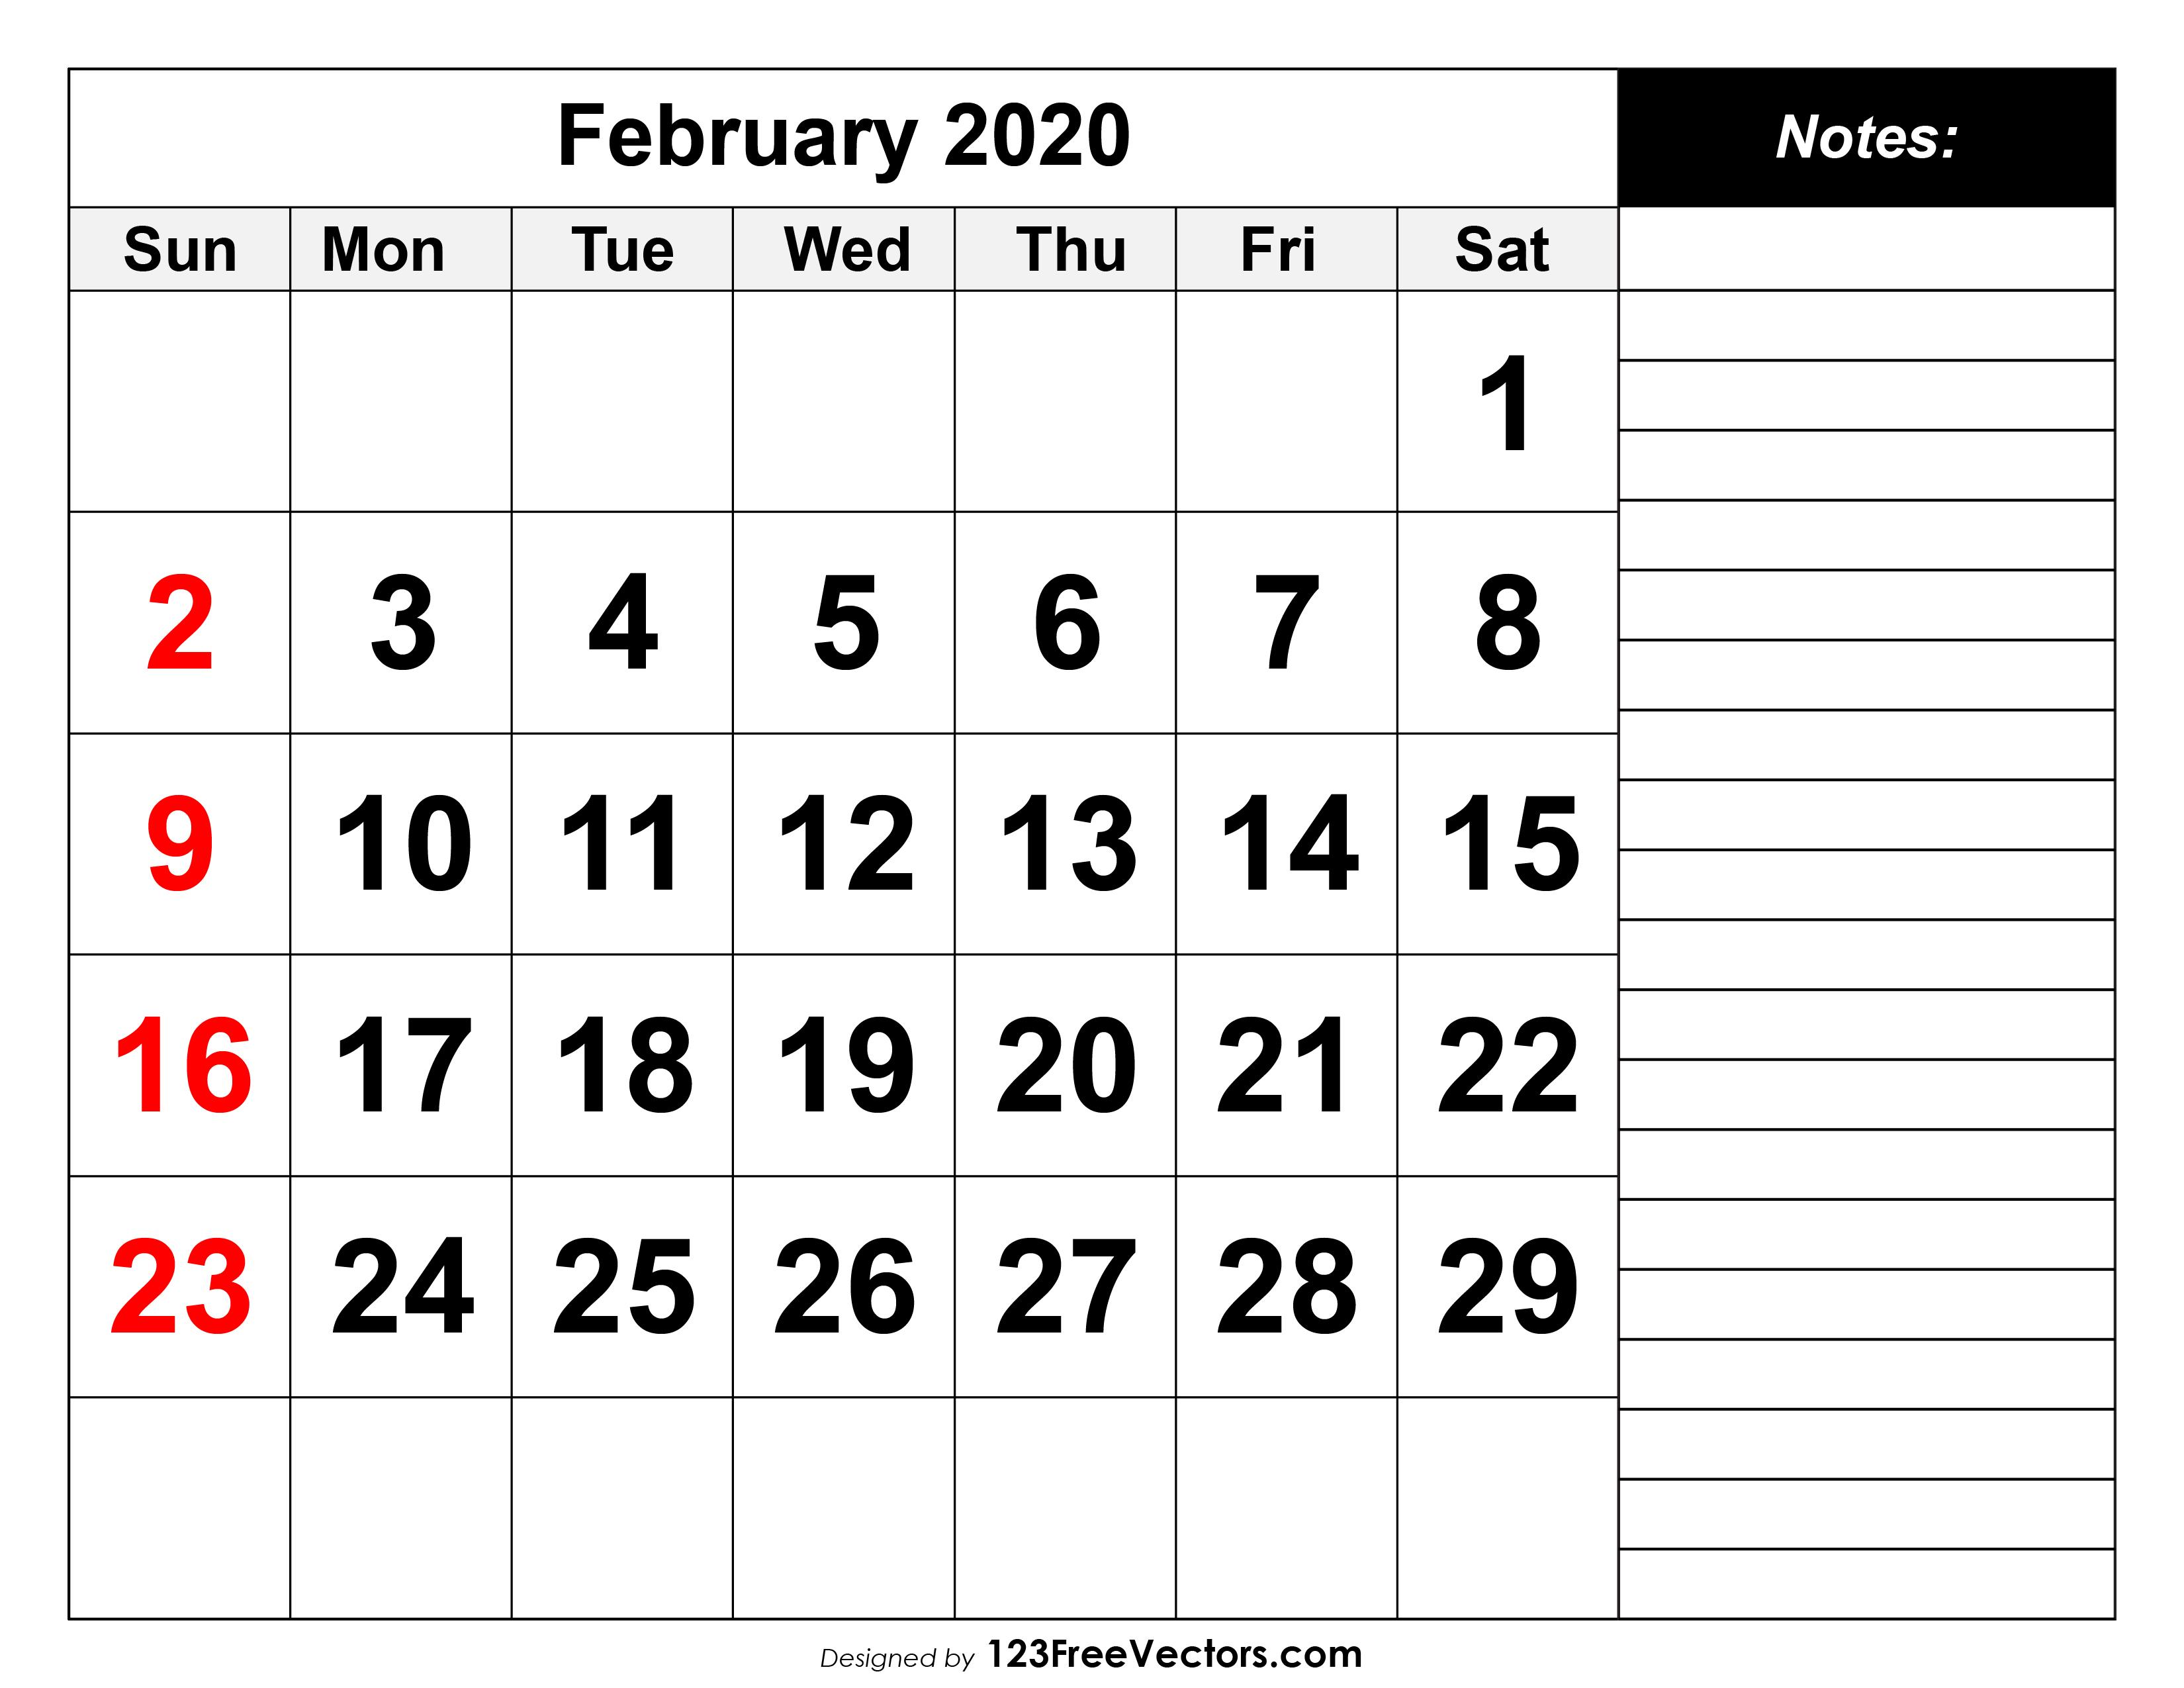 photograph relating to Feb. Printable Calendar called February 2020 Printable Calendar